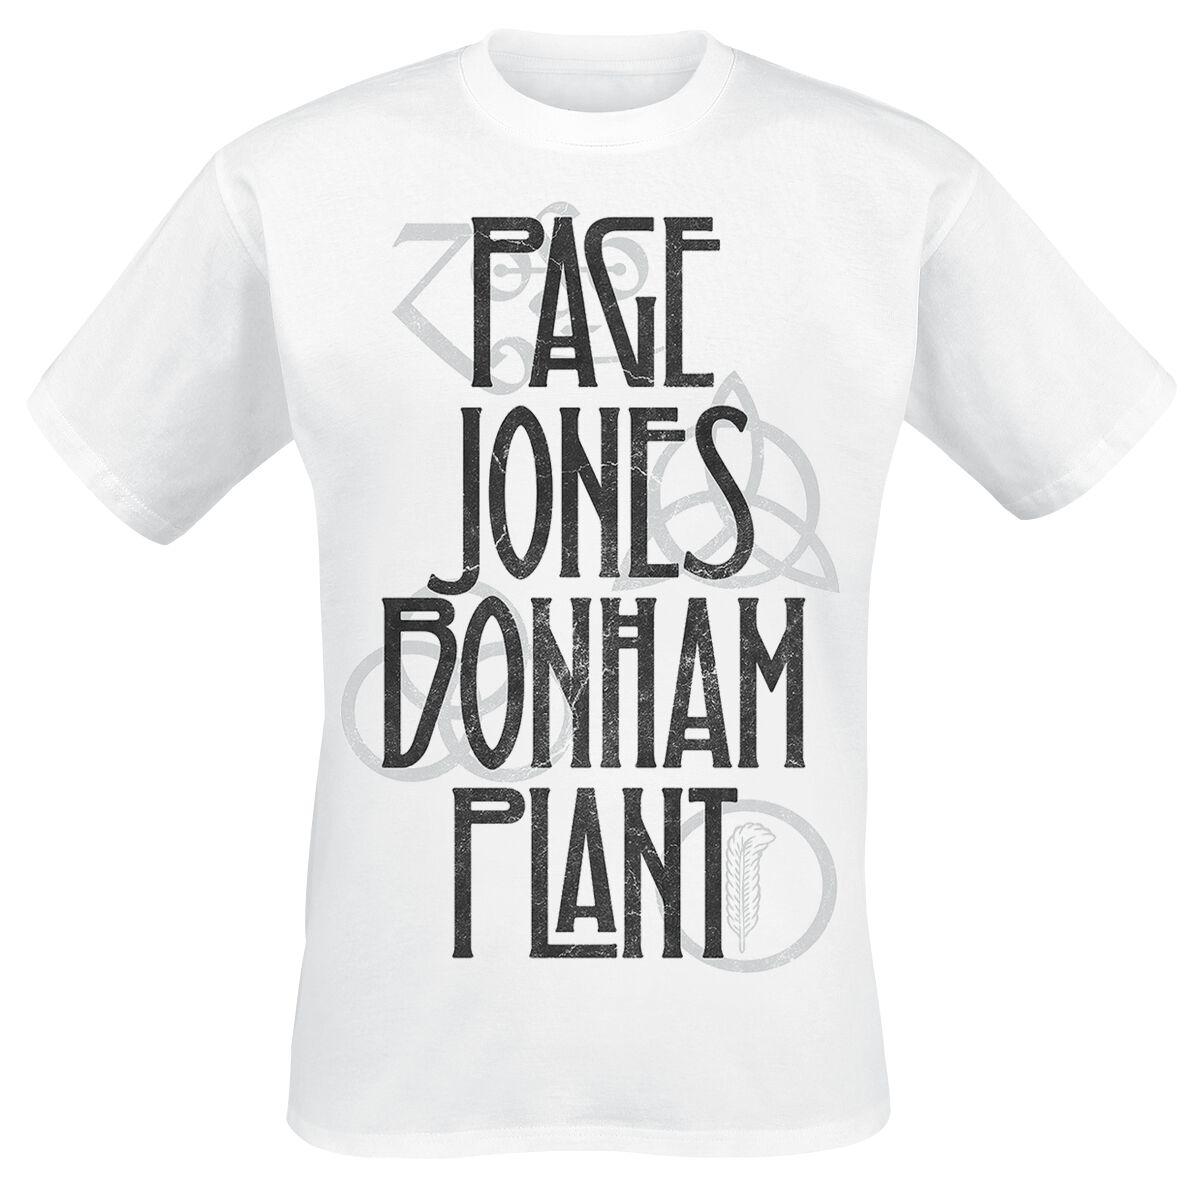 Image of   Led Zeppelin Page Jones Bonham Plant T-Shirt hvid